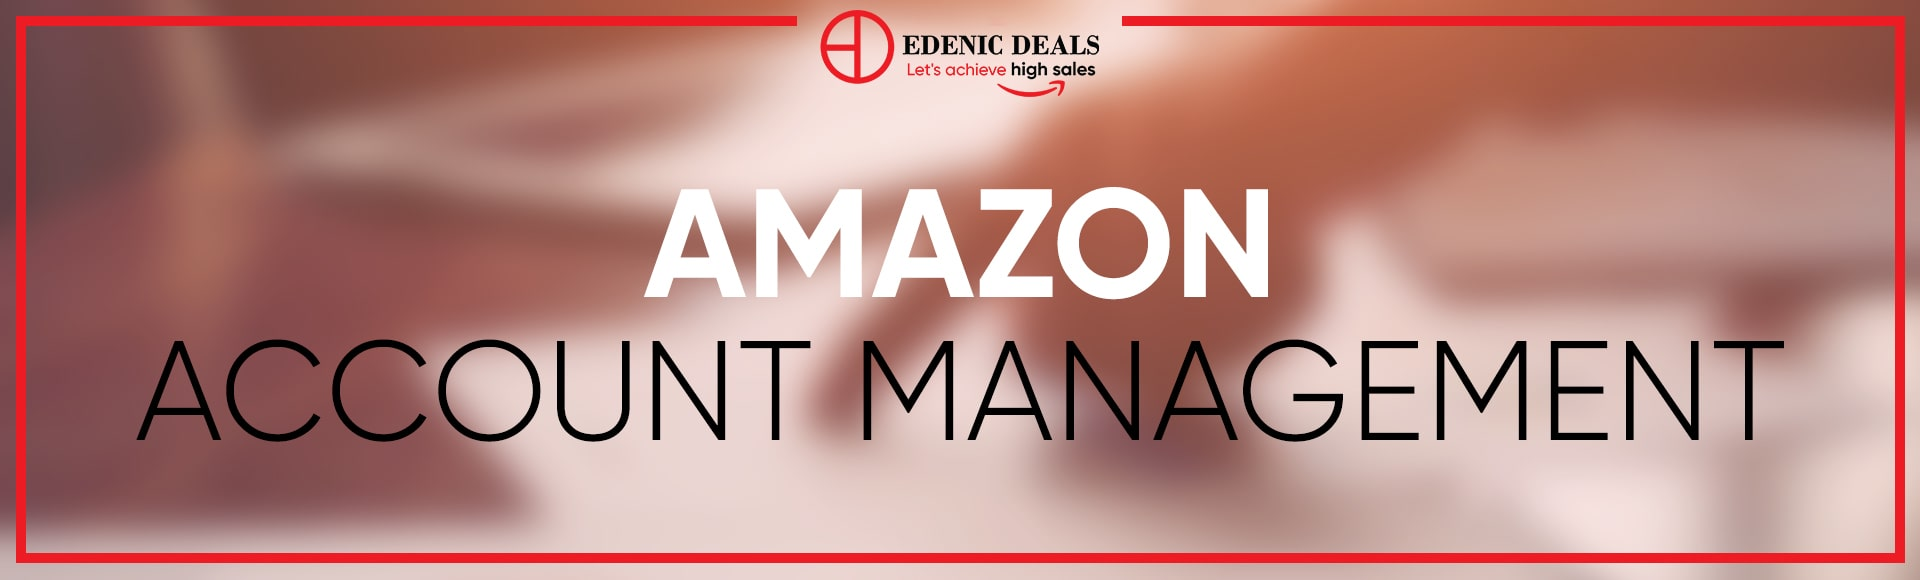 Amazon Account management Edenic Deals